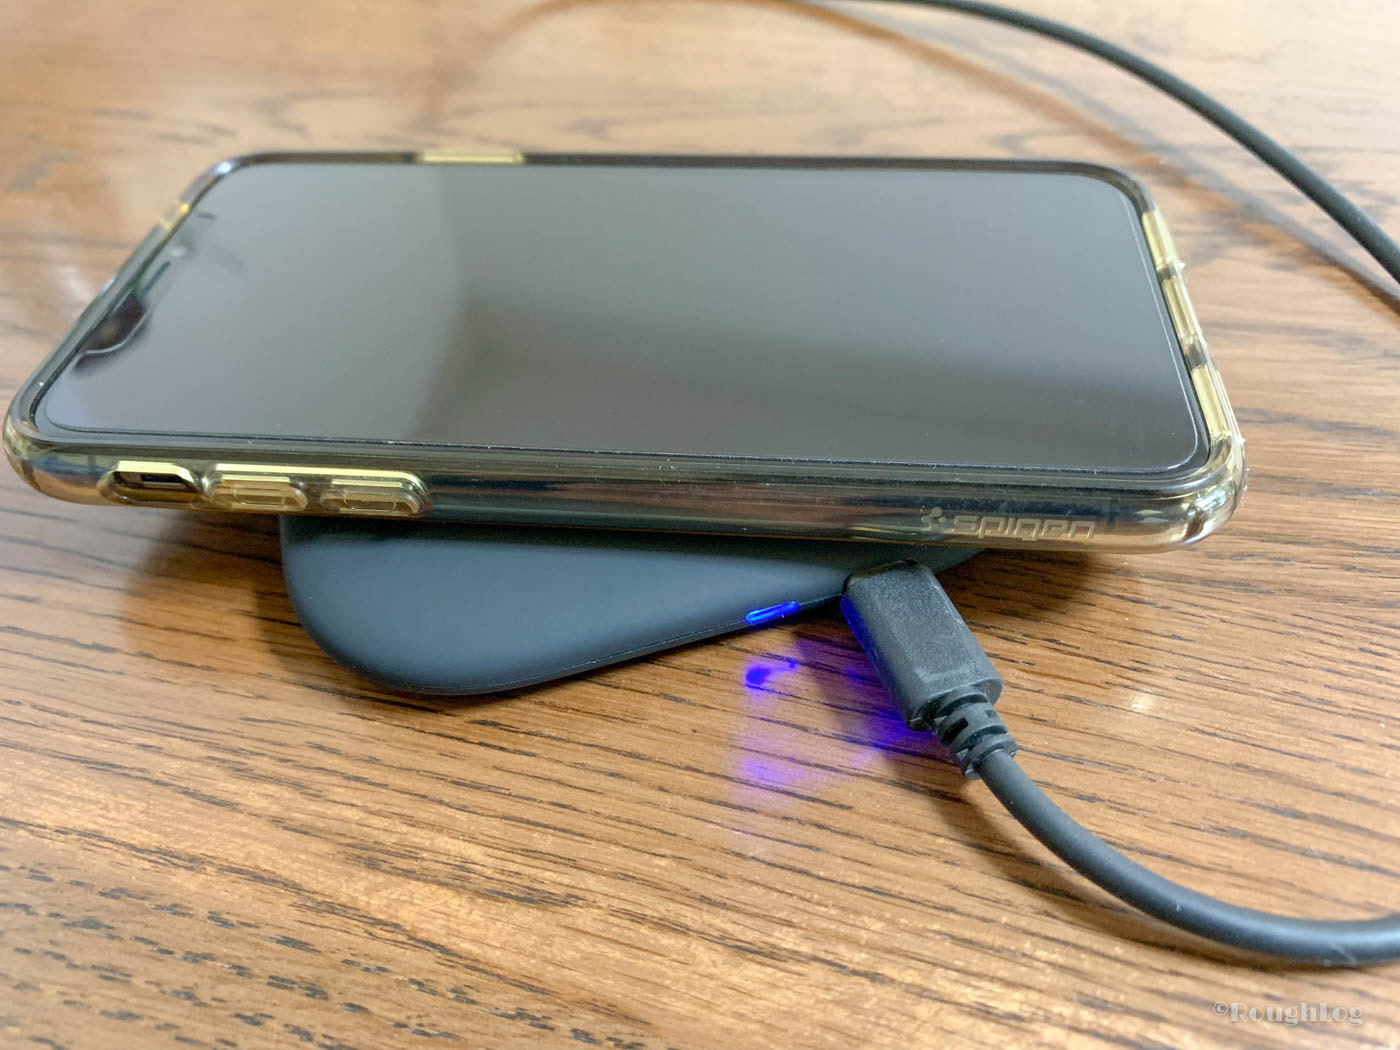 Dodocool製Qiワイヤレス充電器にSpigenのスマホケースを装着したiPhoneXをセットして充電中